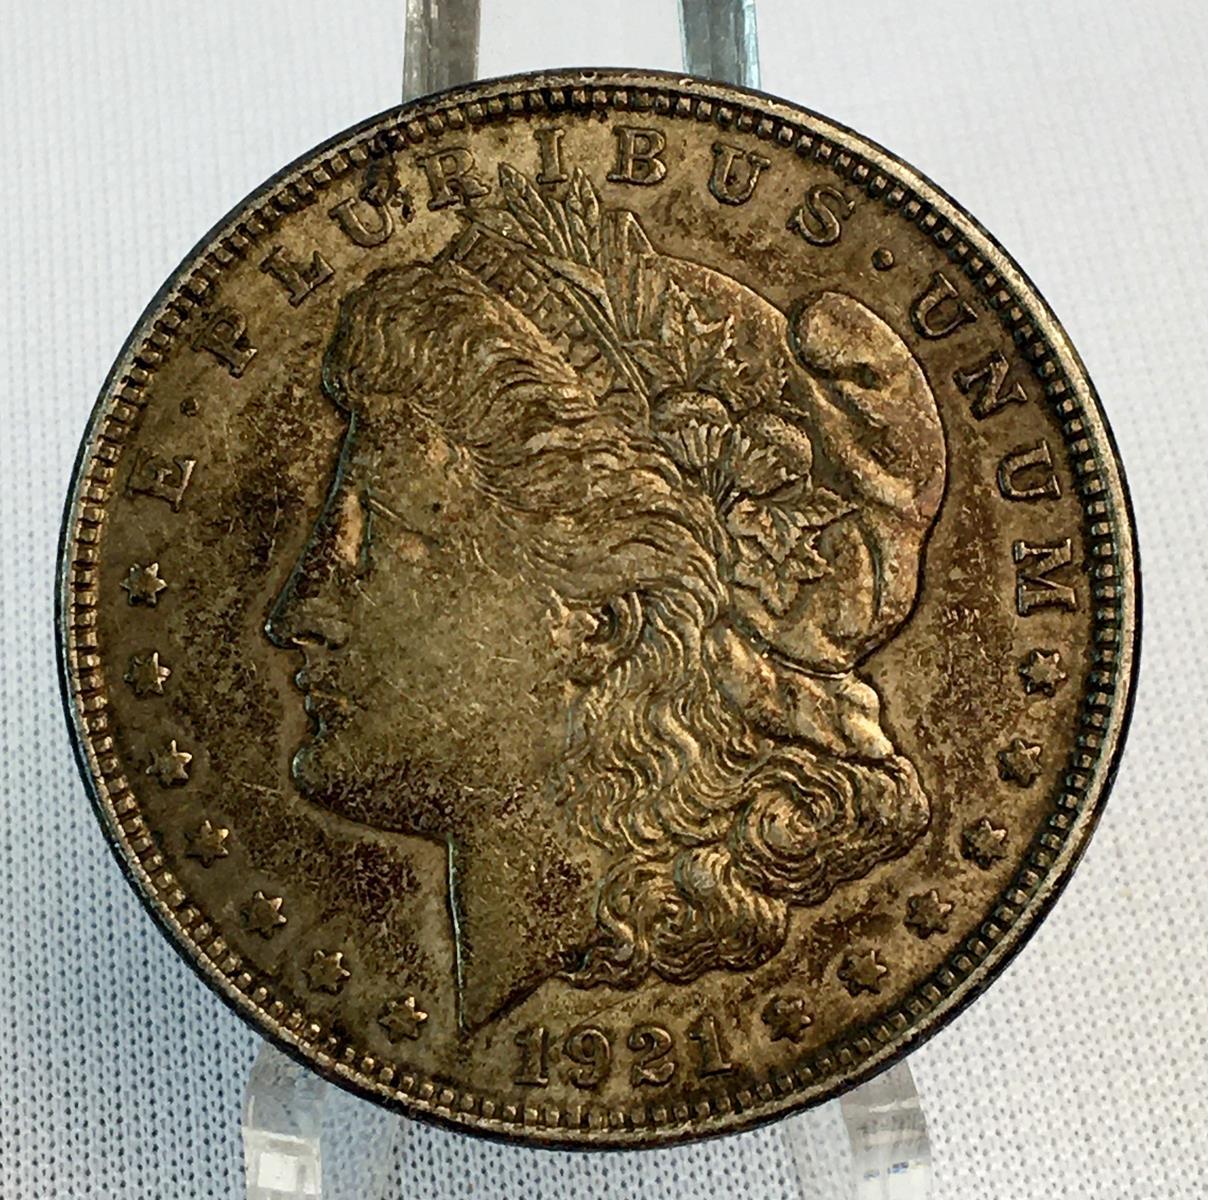 1921 US $1 Morgan Silver Dollar